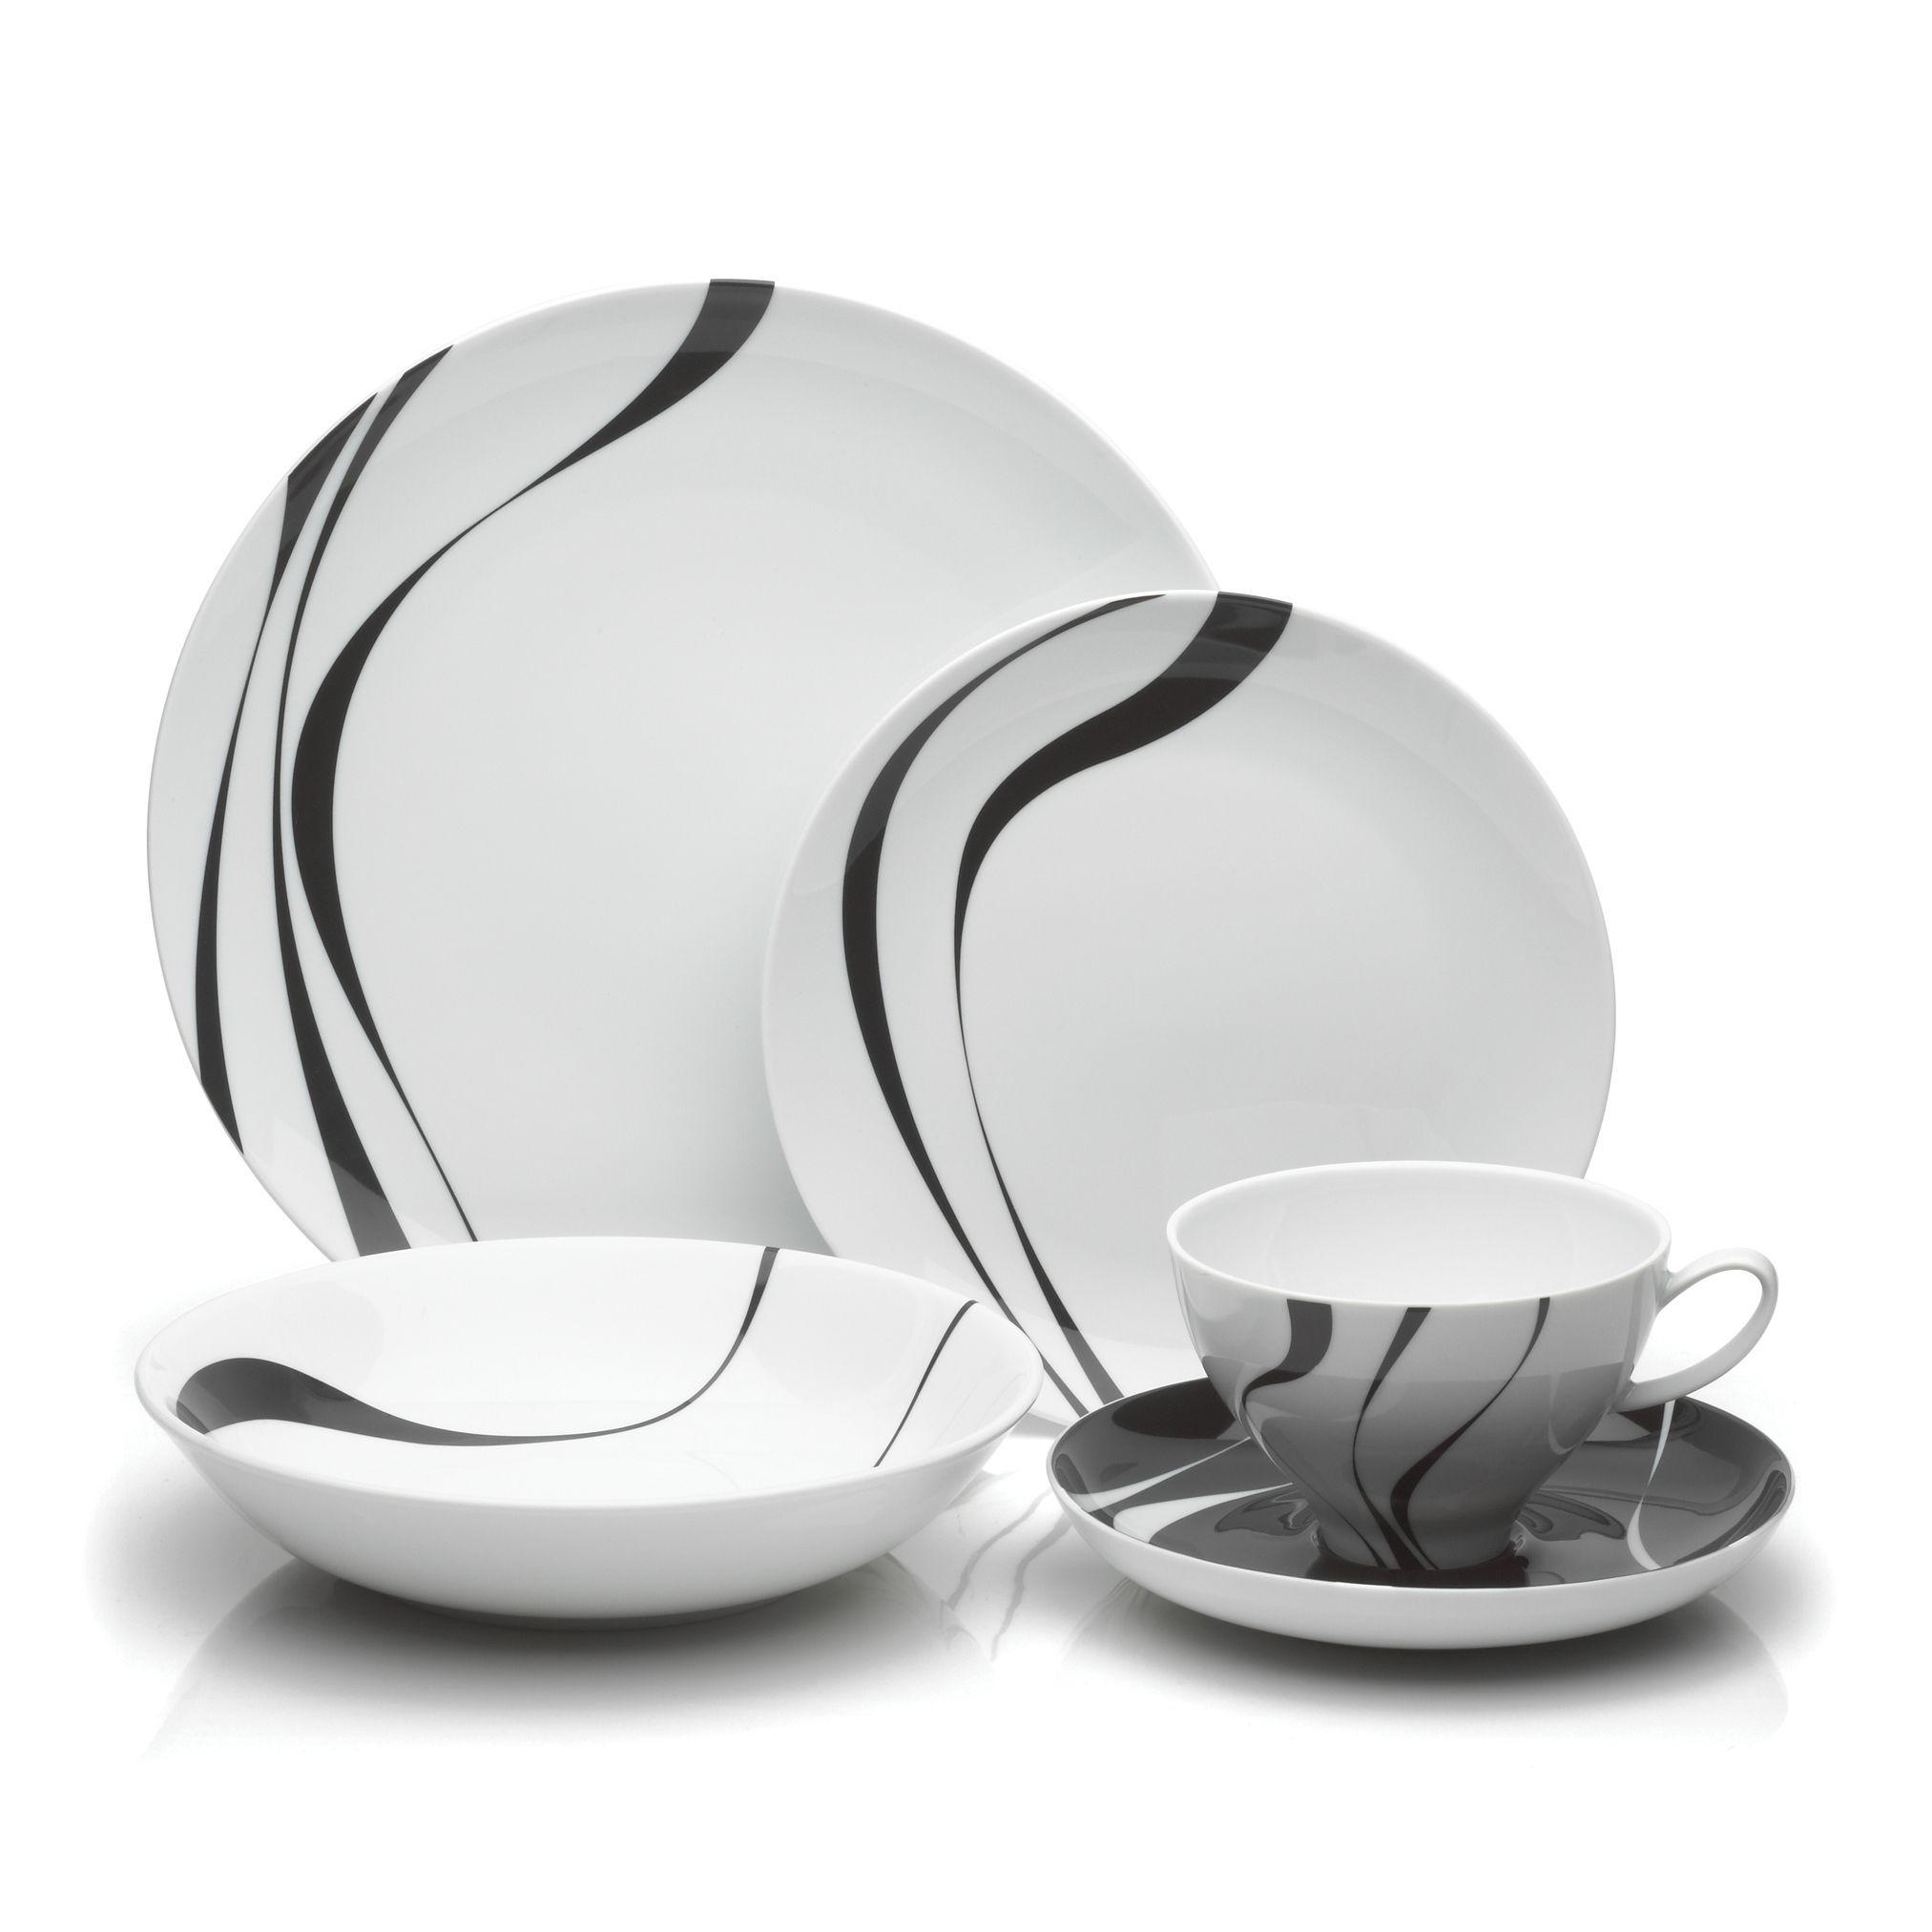 Mikasa u0027Jazzu0027 5-piece Dinnerware  sc 1 st  Pinterest & Mikasa u0027Jazzu0027 5-piece Dinnerware | Mikasa Dinnerware and Pottery